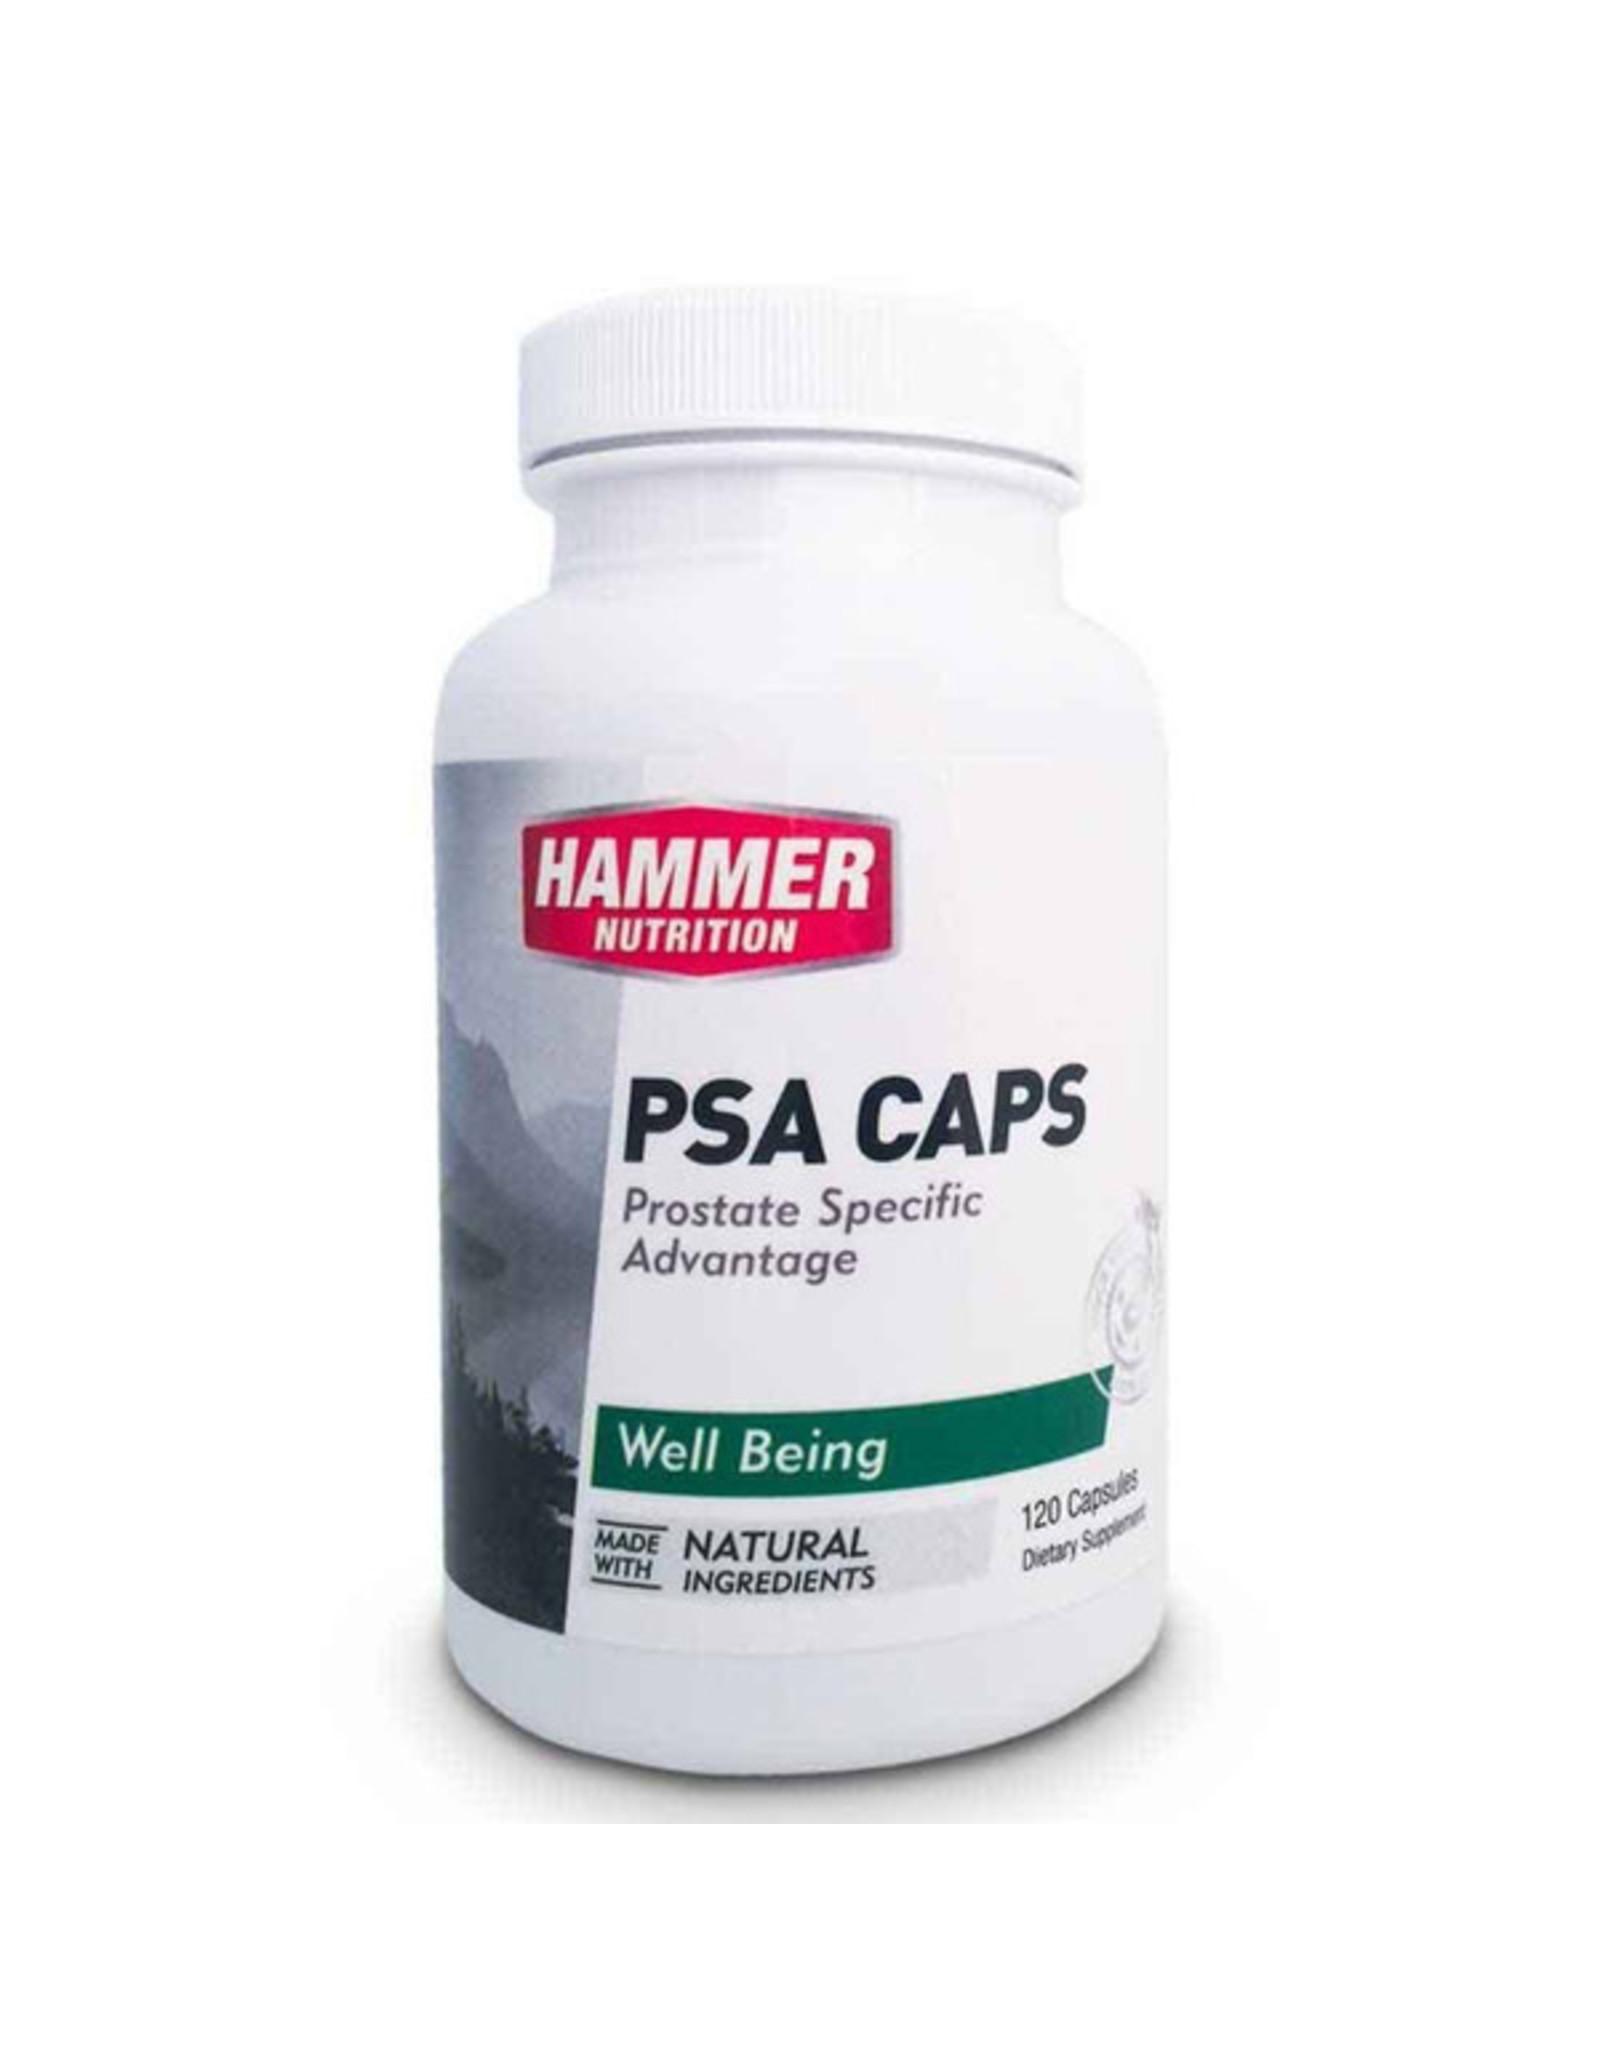 Hammer Nutrition Hammer Nutrition Prostate Specific Advantage (60 Cap)